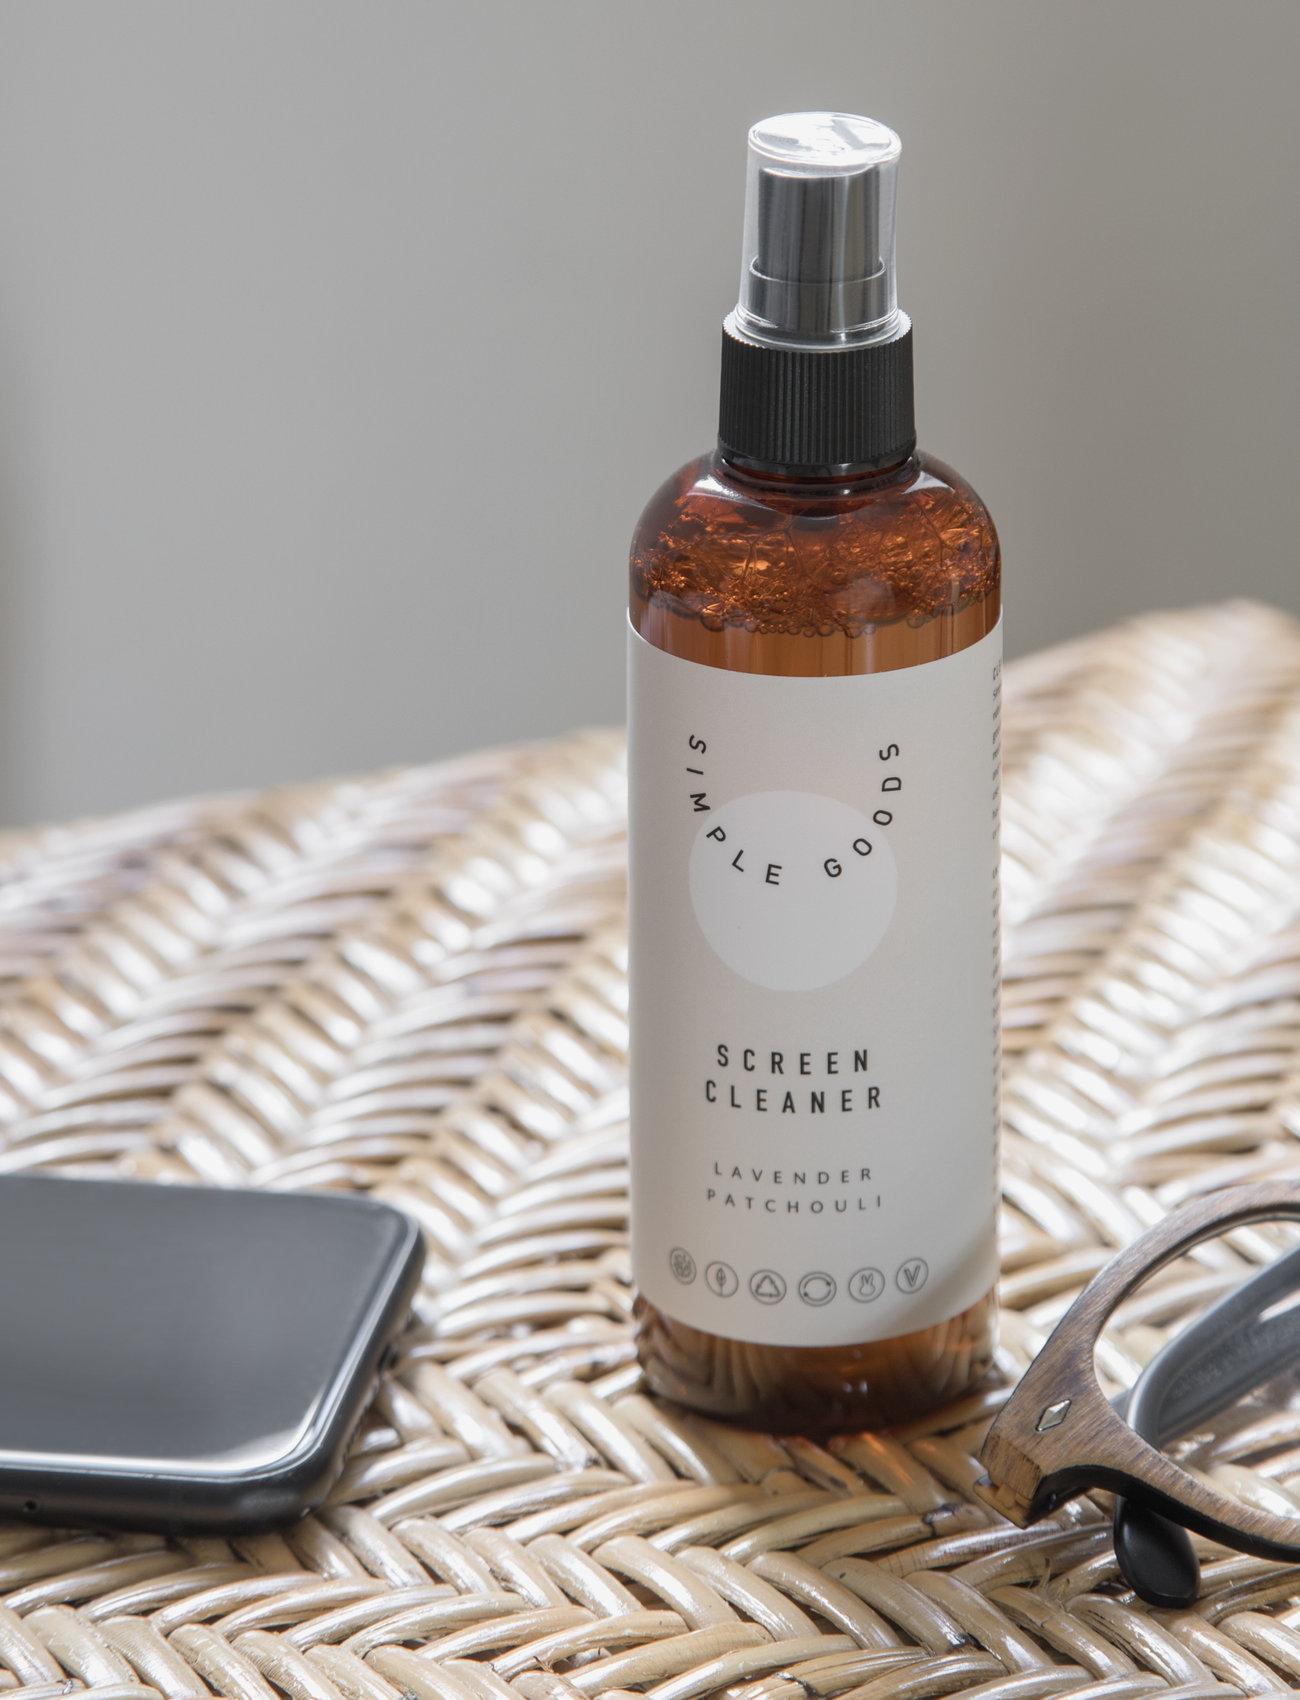 Simple Goods - Screen Cleaner, Lavender, Pacthouli - Övrigt diskning & städning - clear - 1